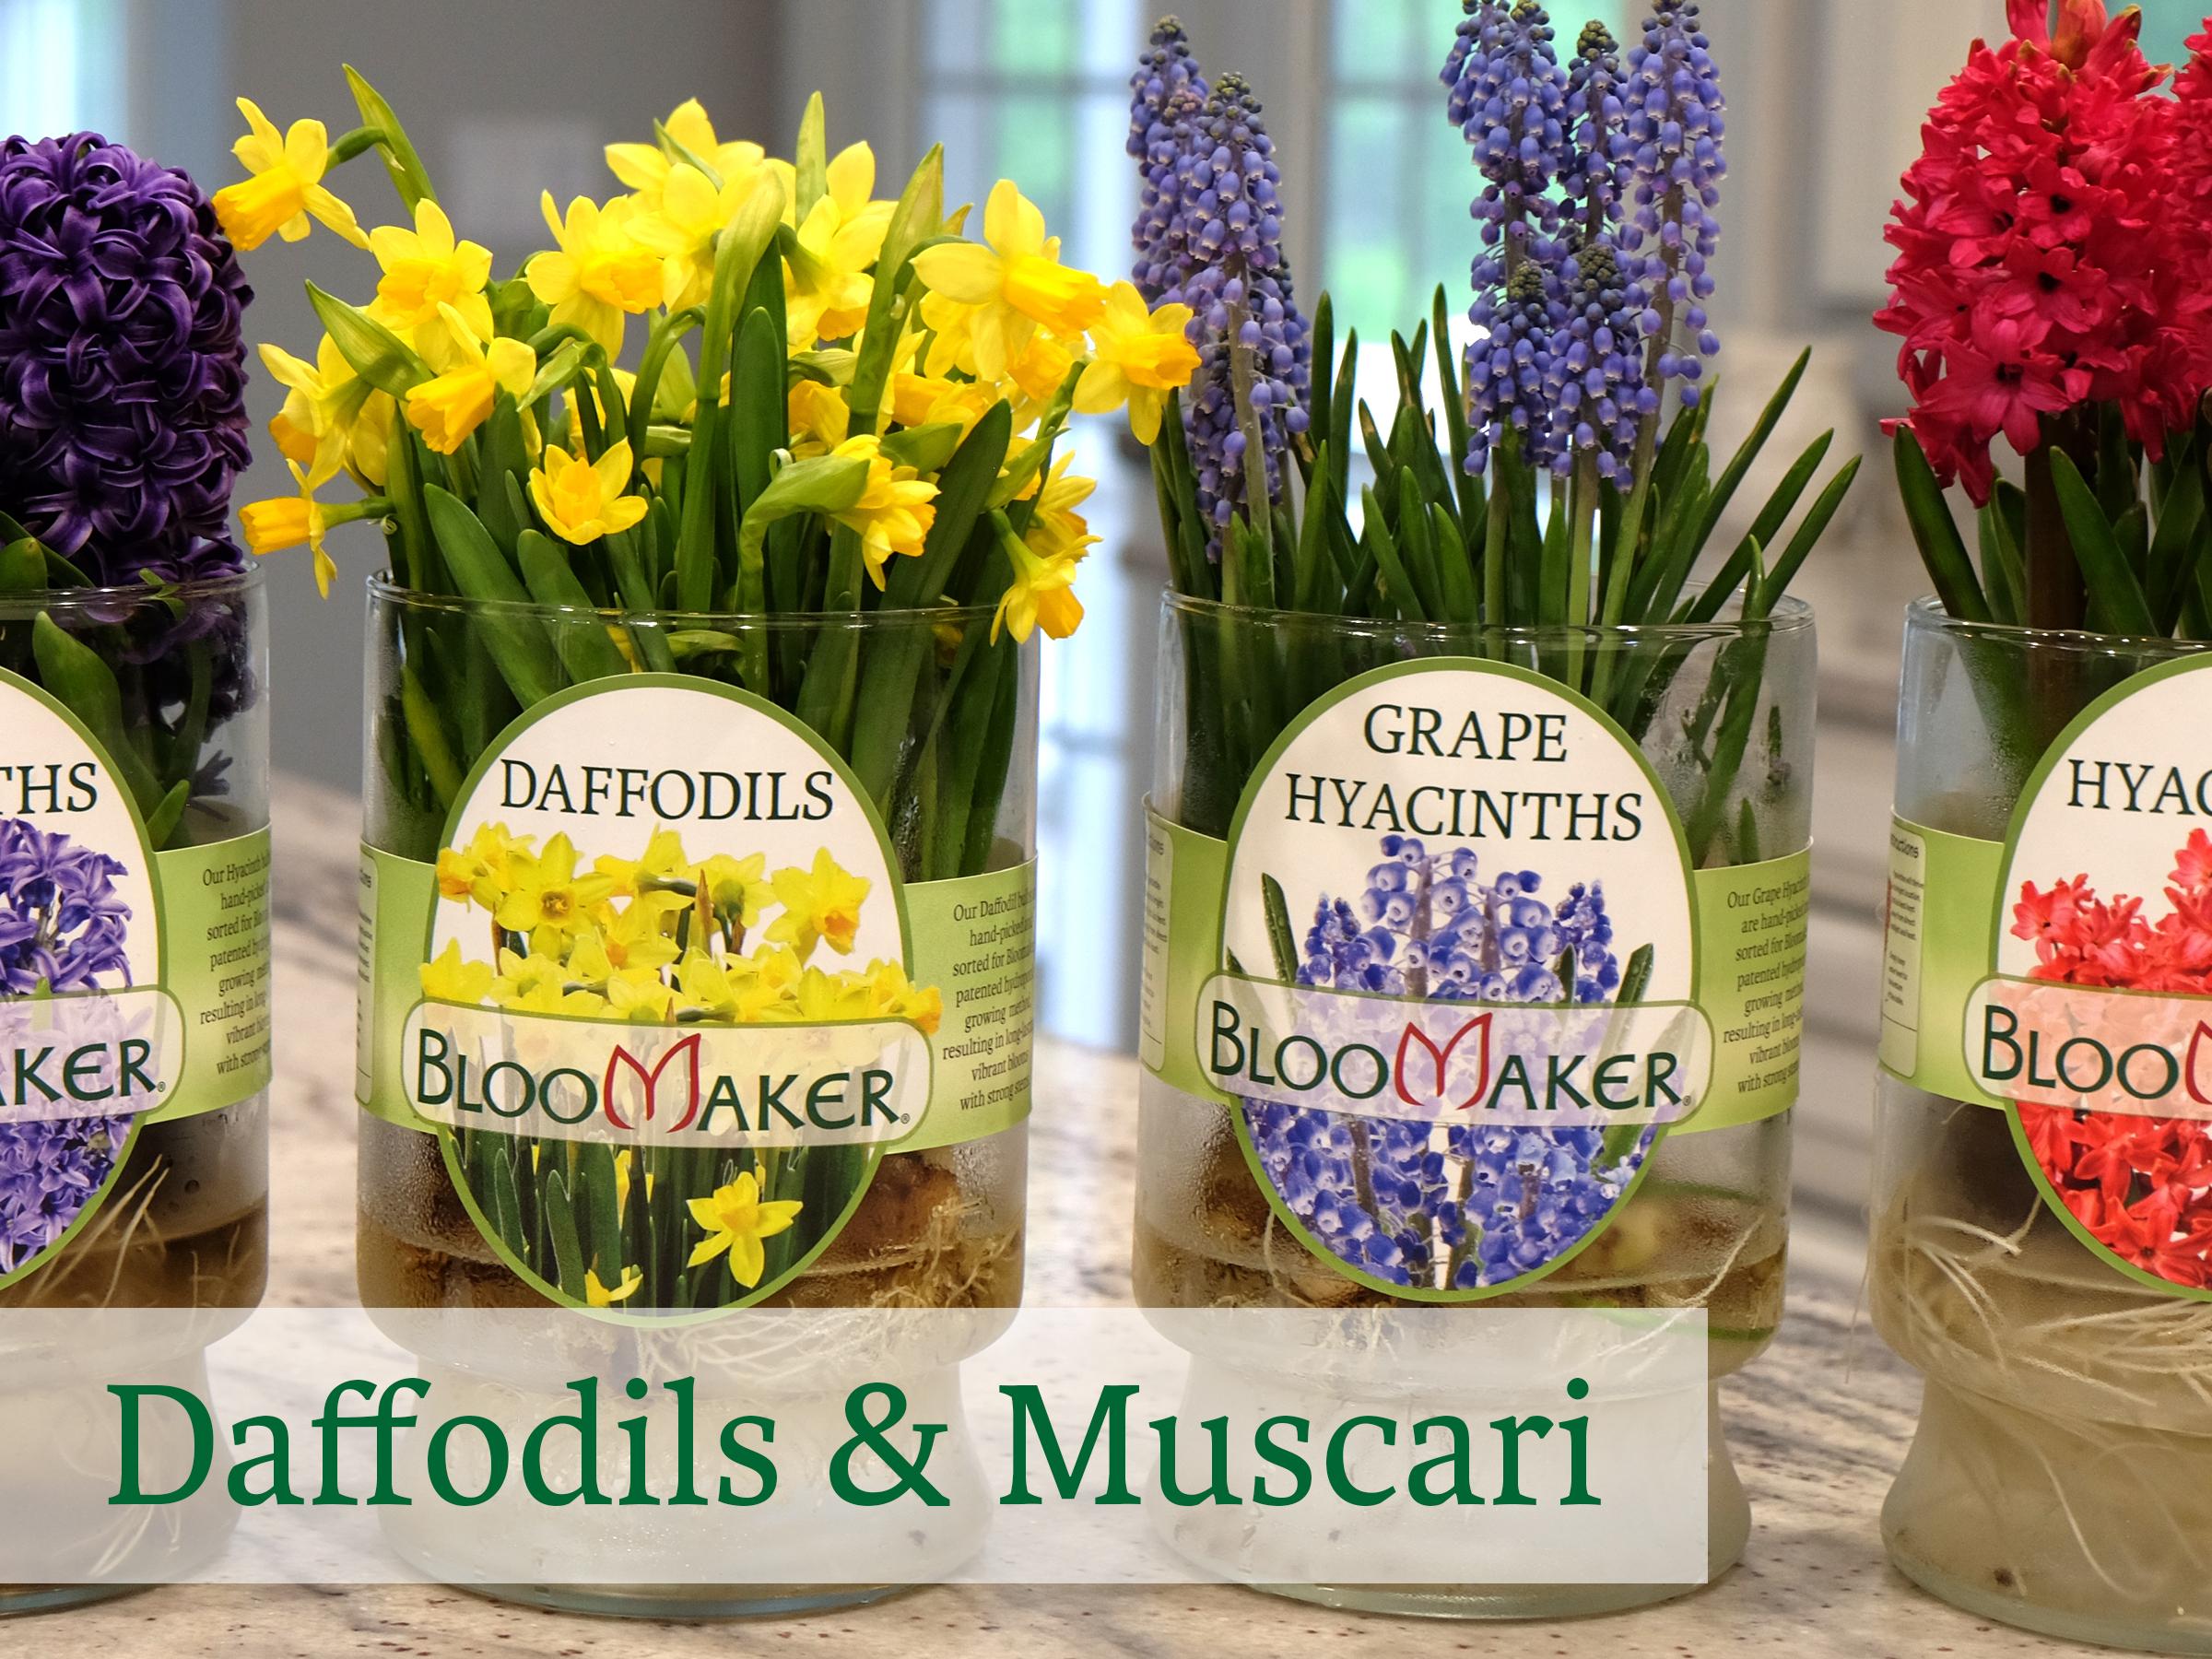 Bloomaker Daffodils and Muscari DSCF4736.jpg